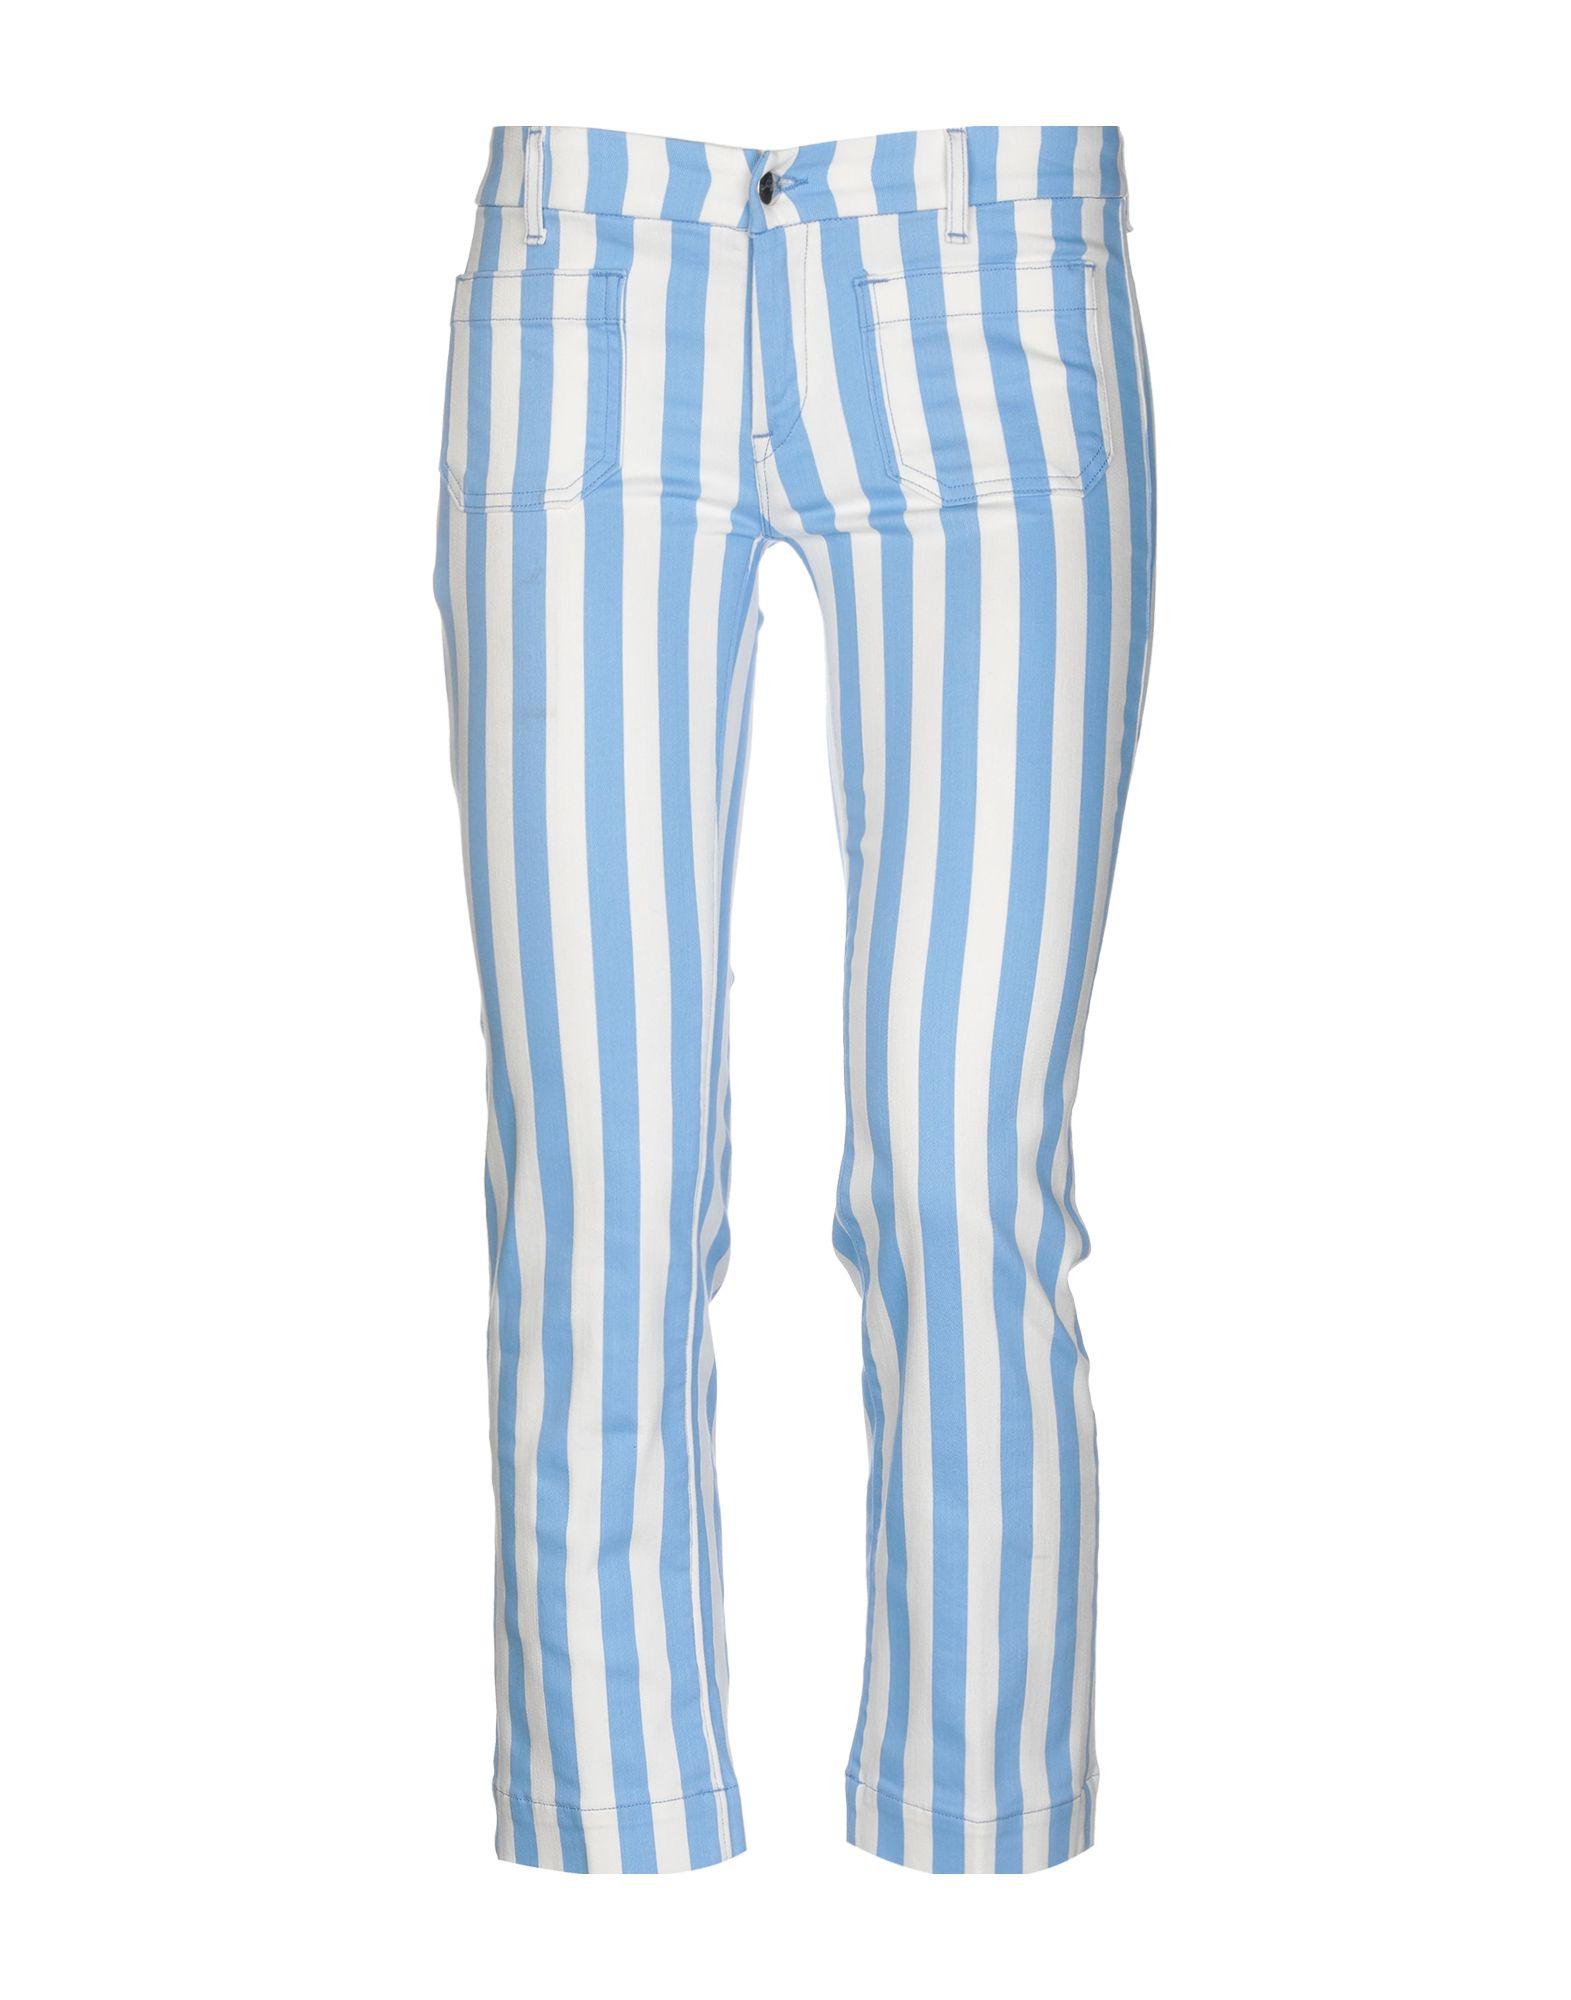 THE SEAFARER Джинсовые брюки the seafarer блузка